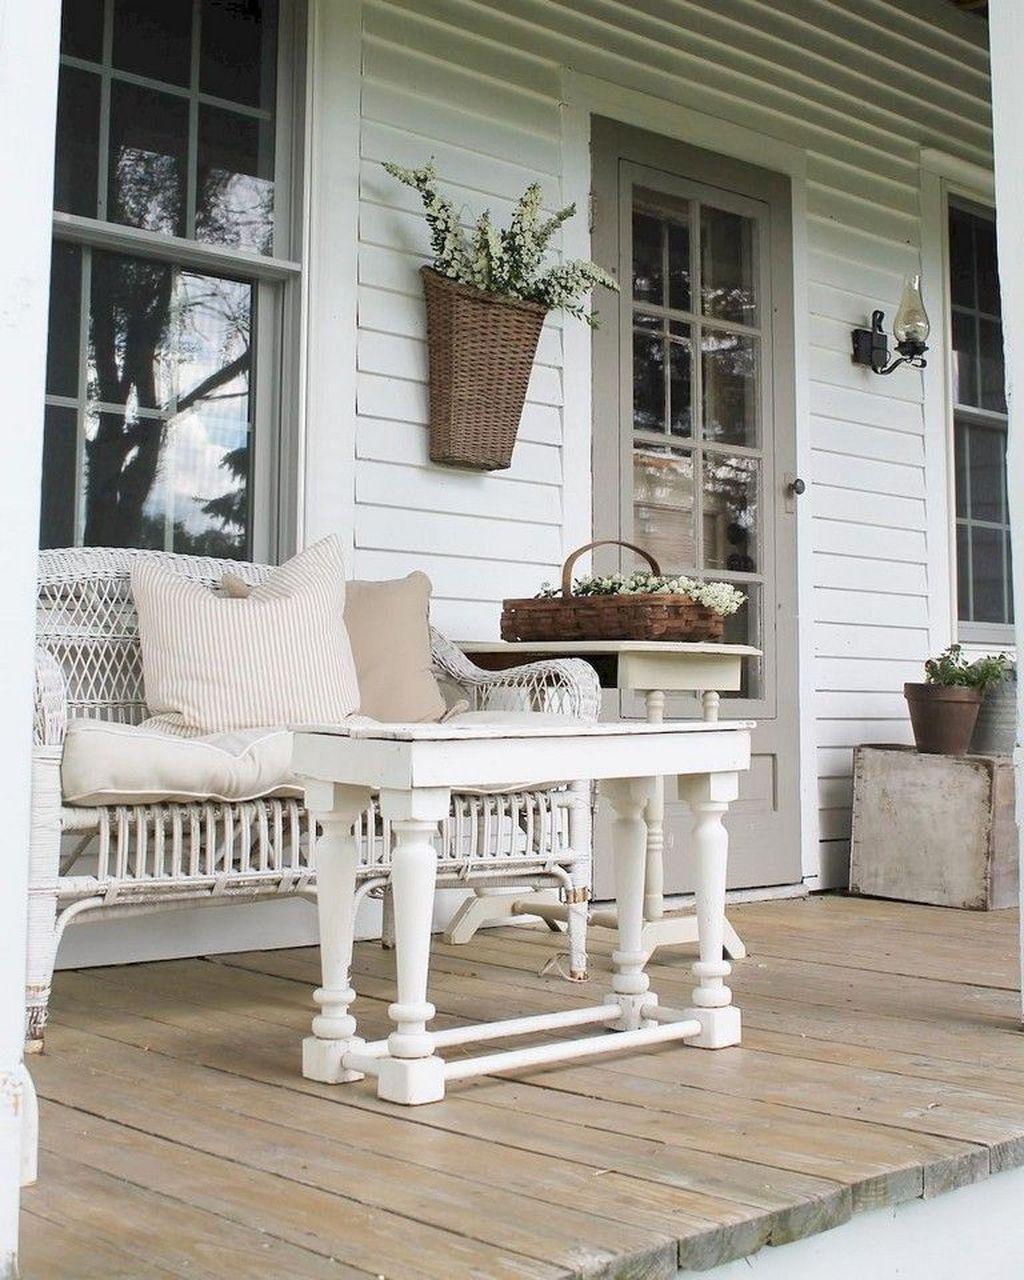 Rustic Homedecor Ideas: 45 Amusing Rustic Farmhouse Porch Decor Ideas